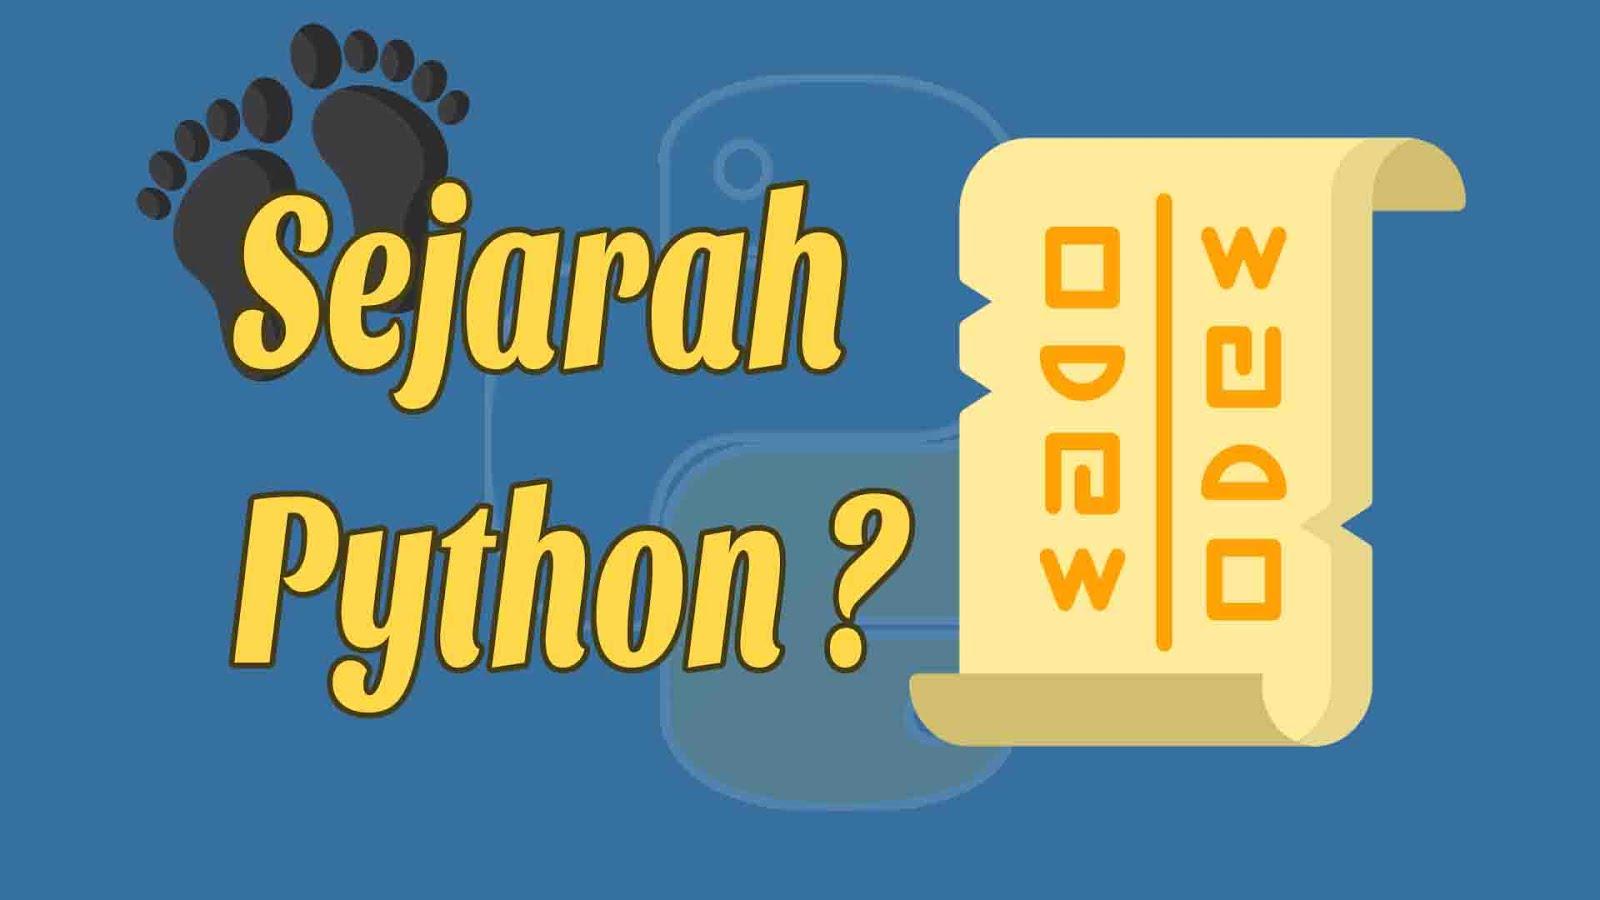 Sejarah Python